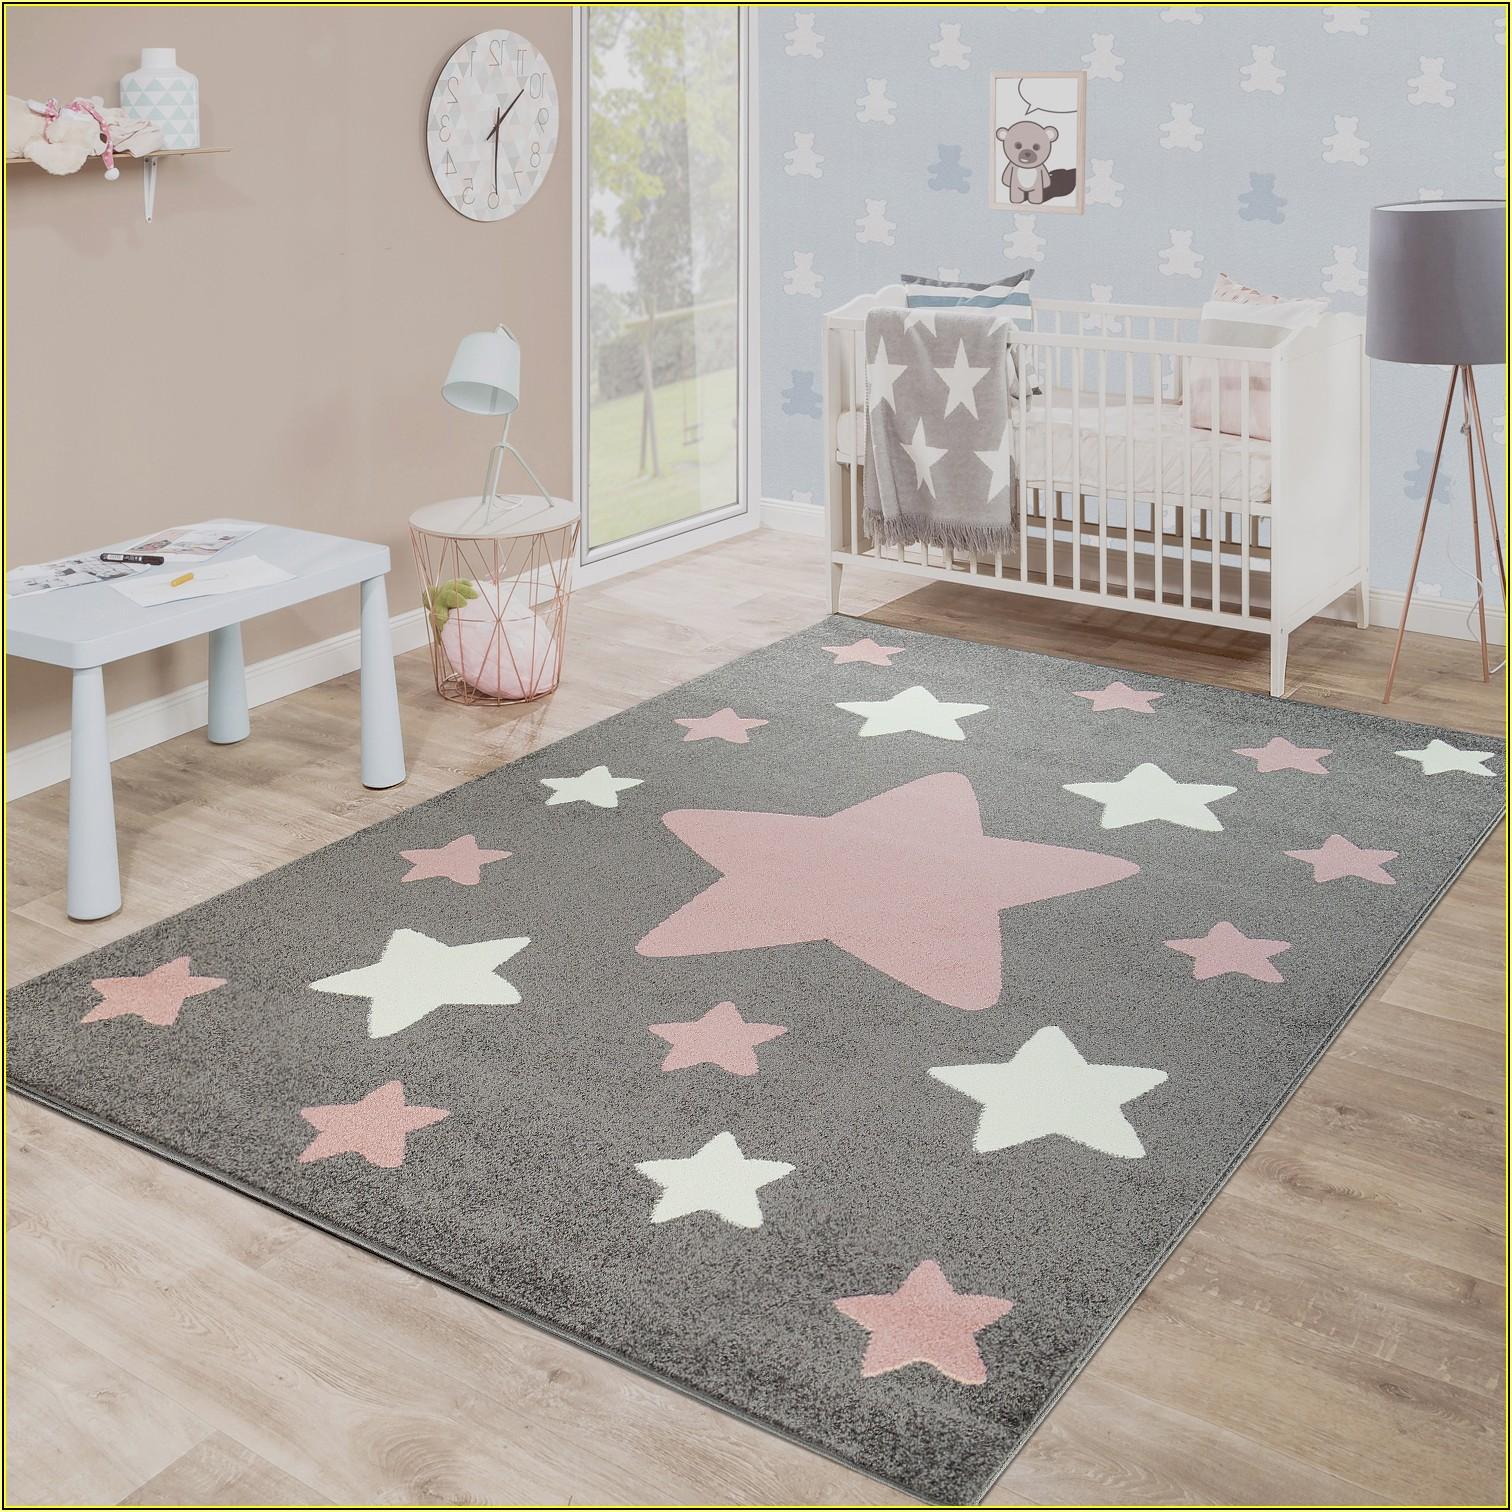 Kinderzimmer Teppich Grau Sterne